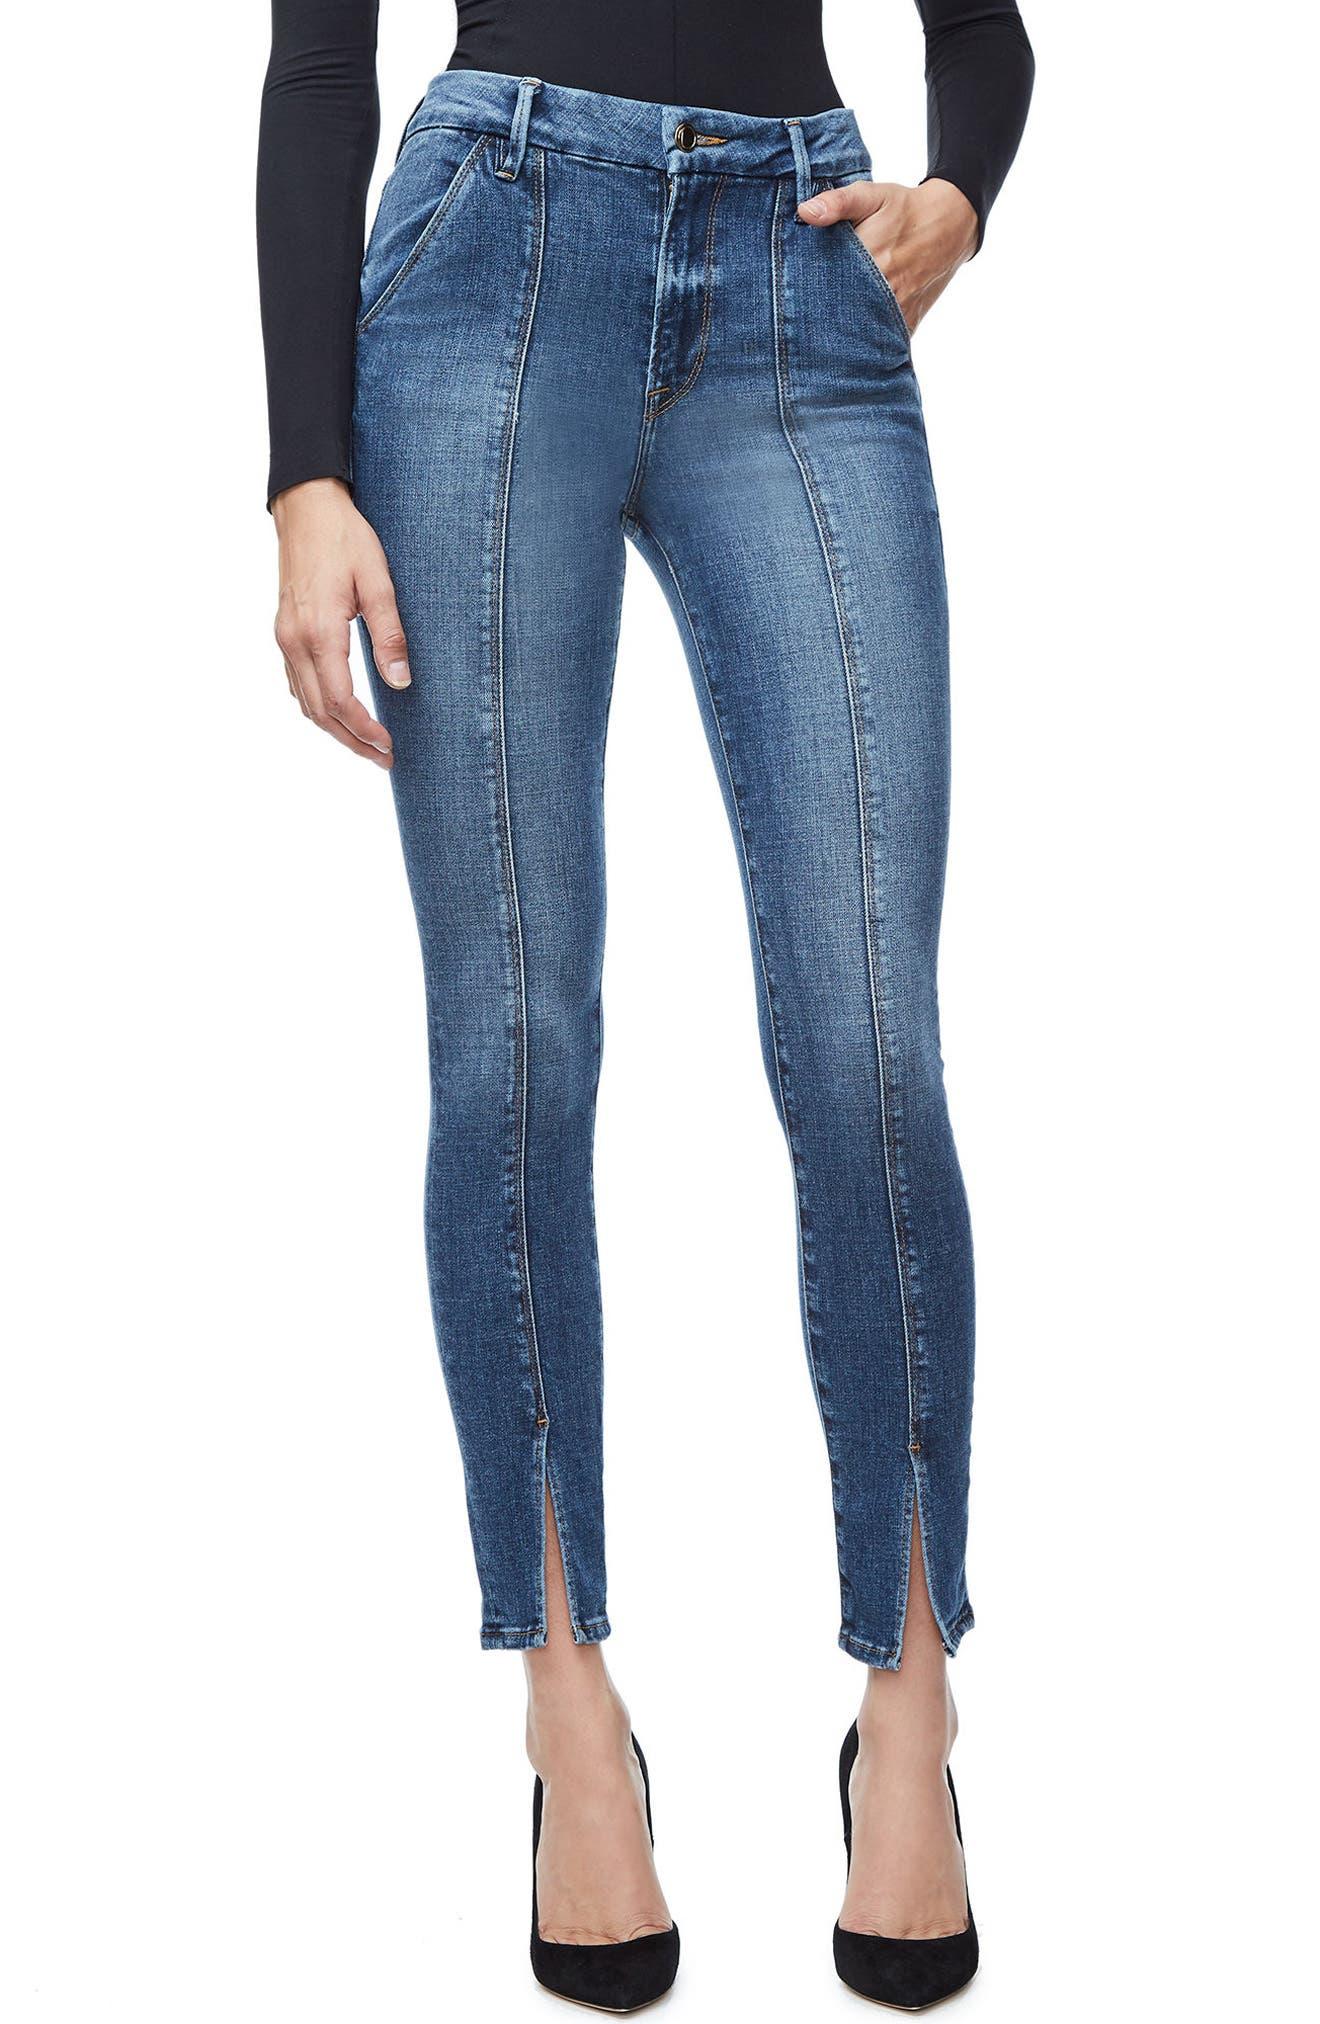 Good Waist Trouser Pocket High Waist Skinny Jeans,                             Main thumbnail 1, color,                             Blue 118